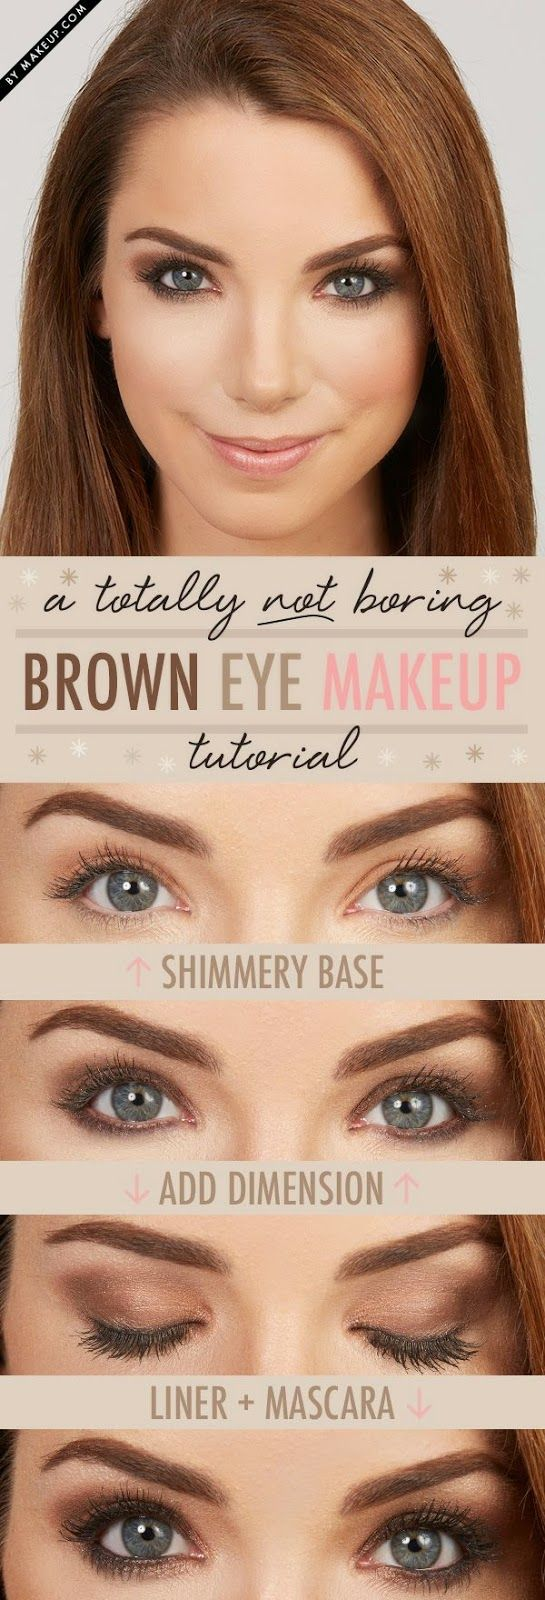 A Totally NOT Boring Brown Eye Makeup Tutorial